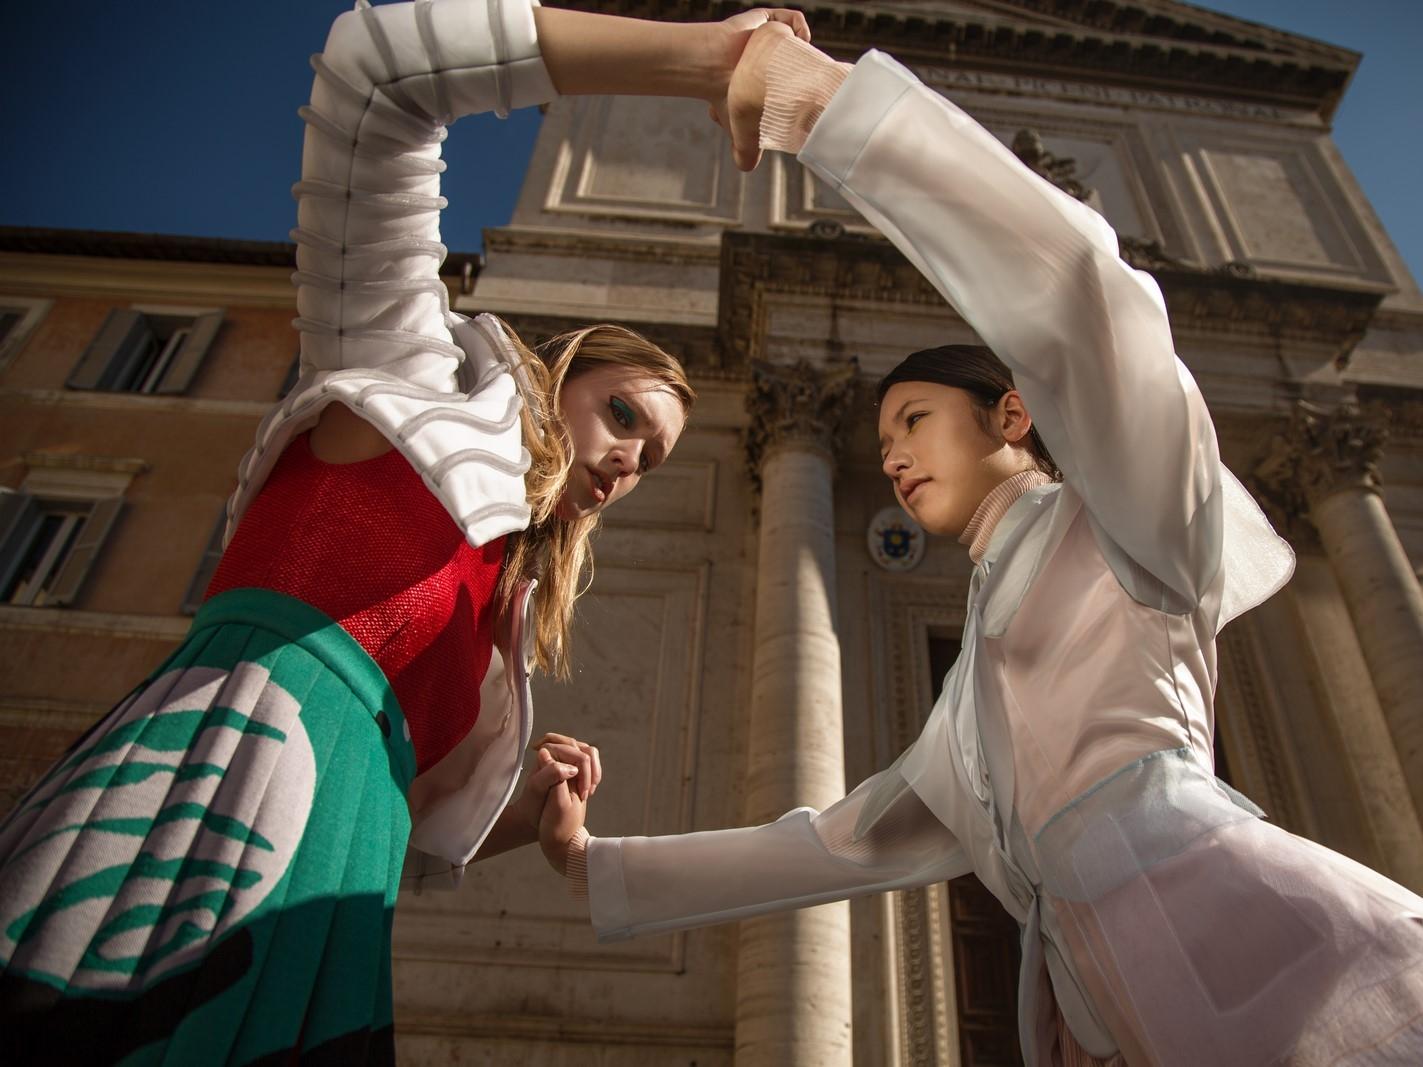 Models: Melissa Pope @themelissarae // Dylan Zoeller @dylan_zoeller Right look: Mauro Muzio Medaglia @m.m.muzio // left look: Alessandra Caponera @alessandracaponera